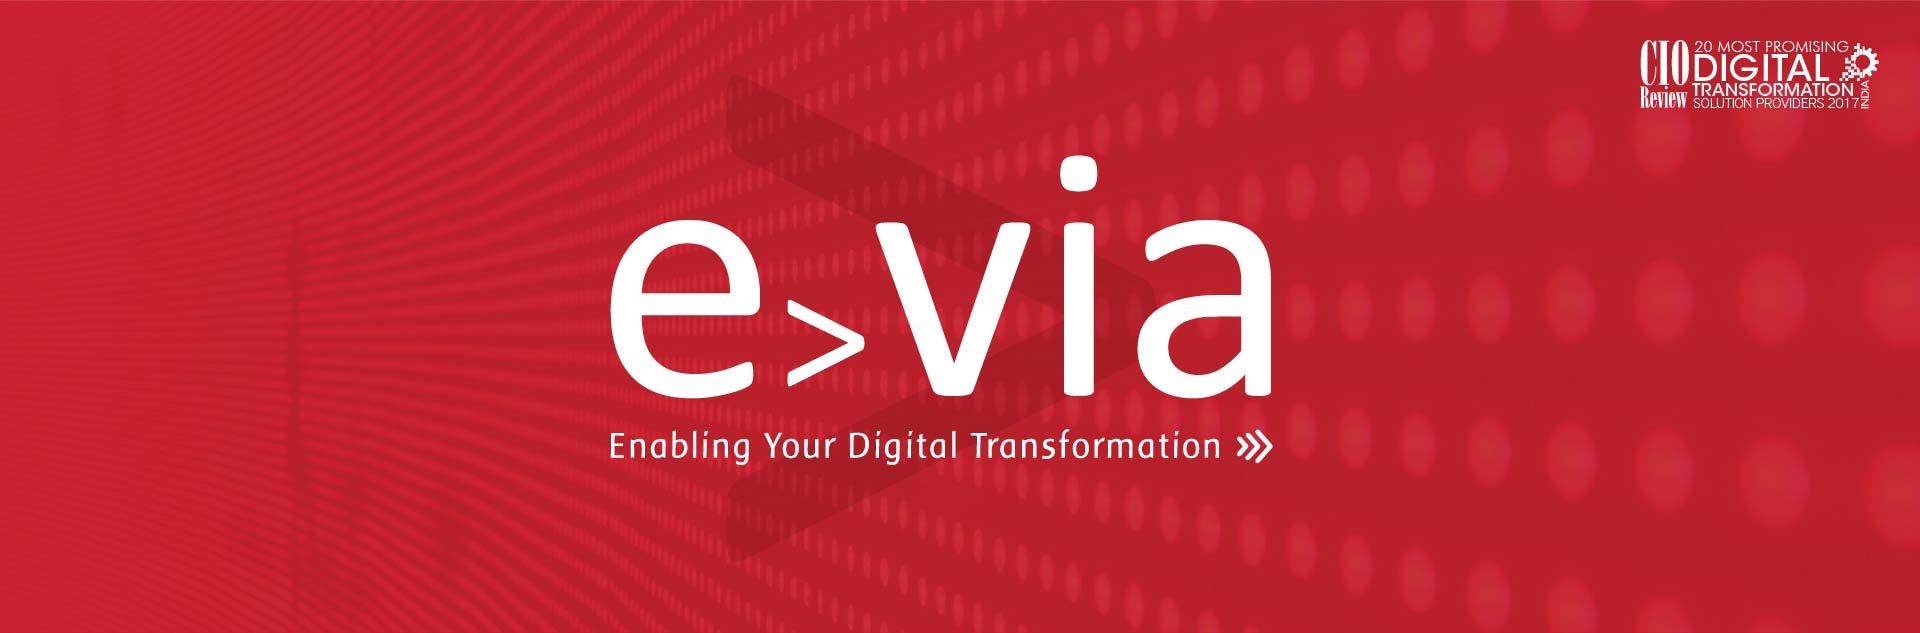 Advantages of Digital Transformation